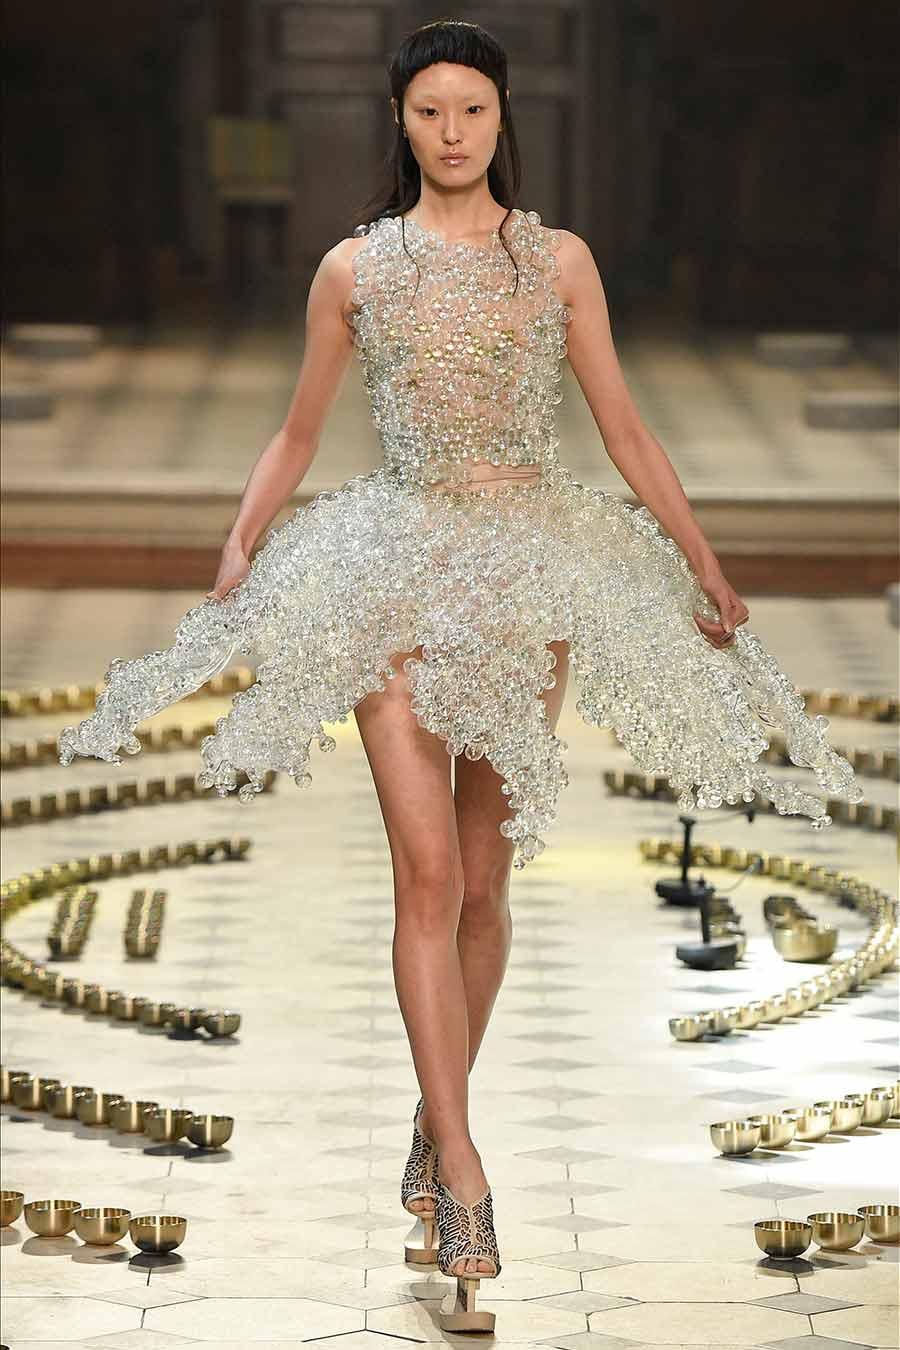 cristalli-look-iris-van-herpen-abito-ballerina-con-200-boule-vetro-foto1